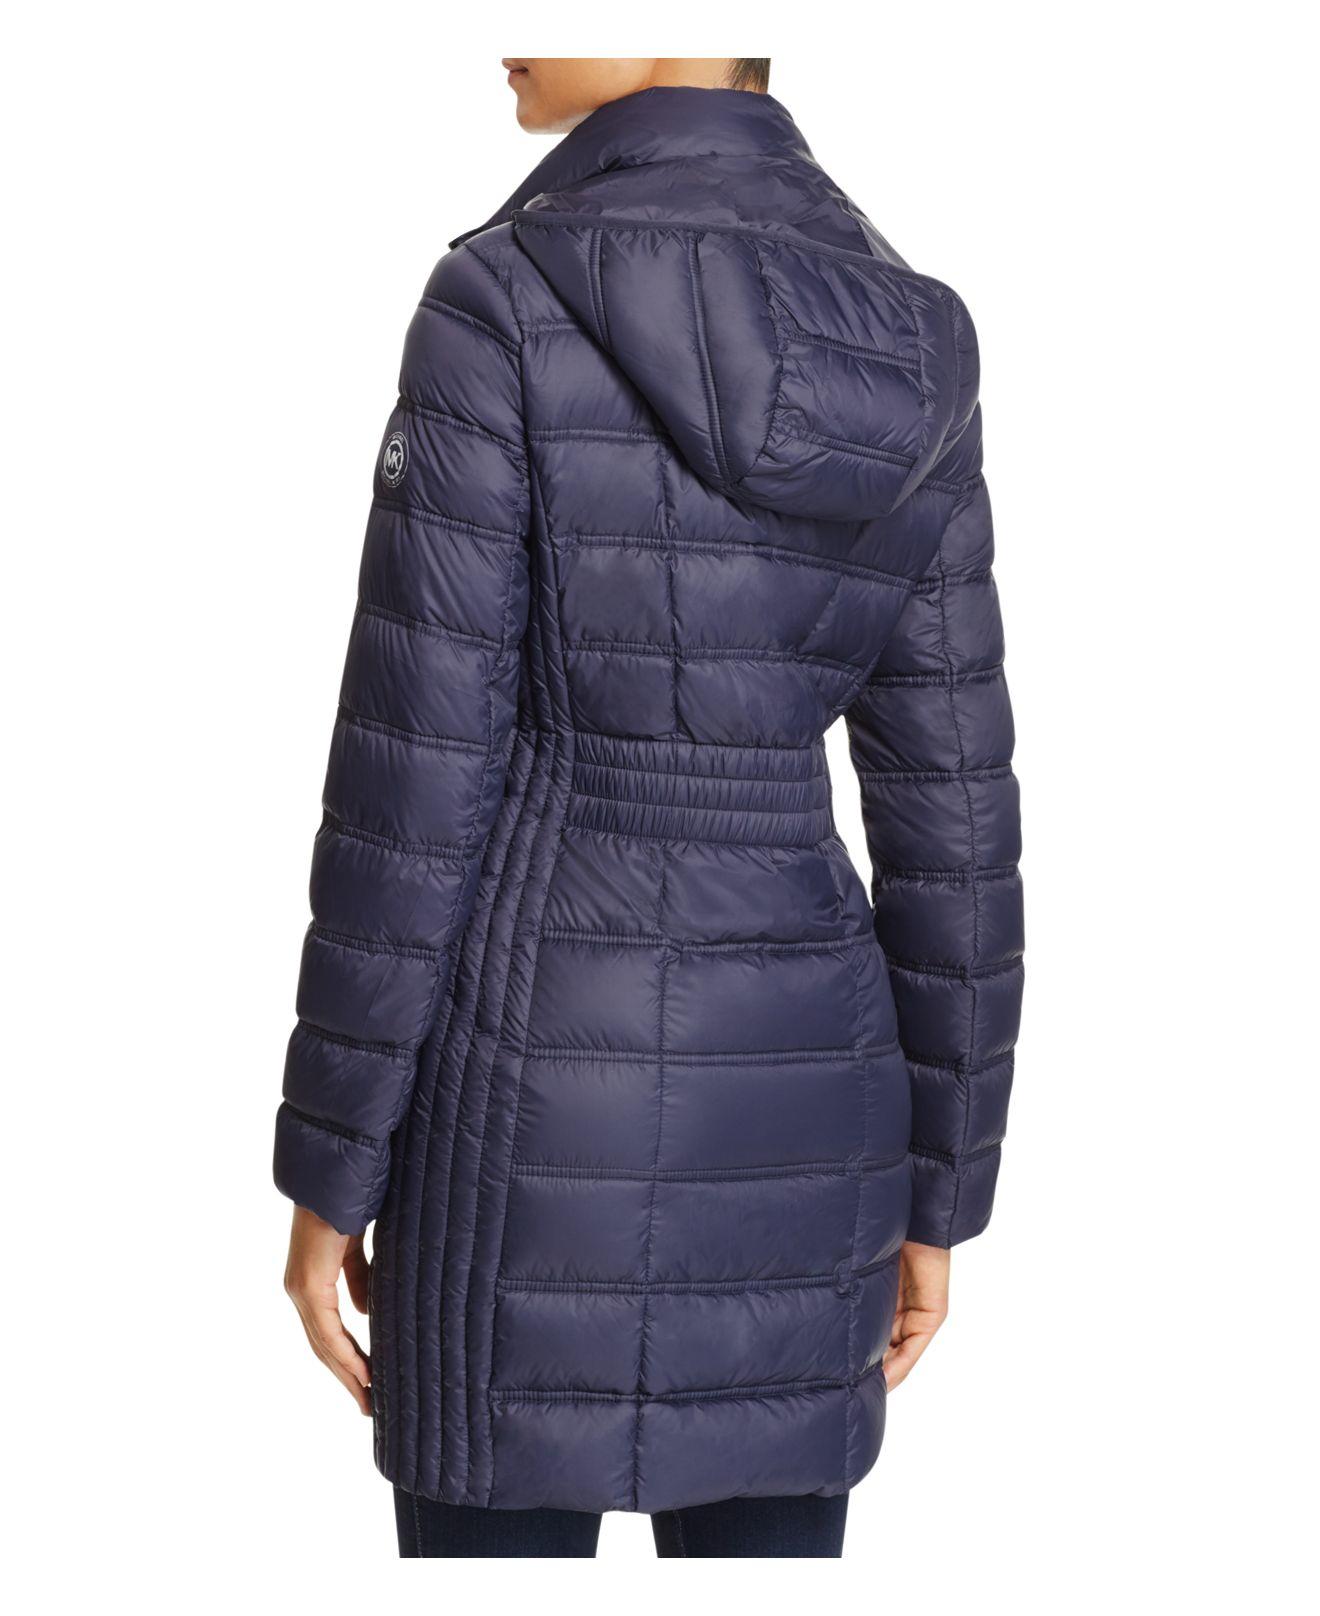 Women S Lightweight Rain Jacket